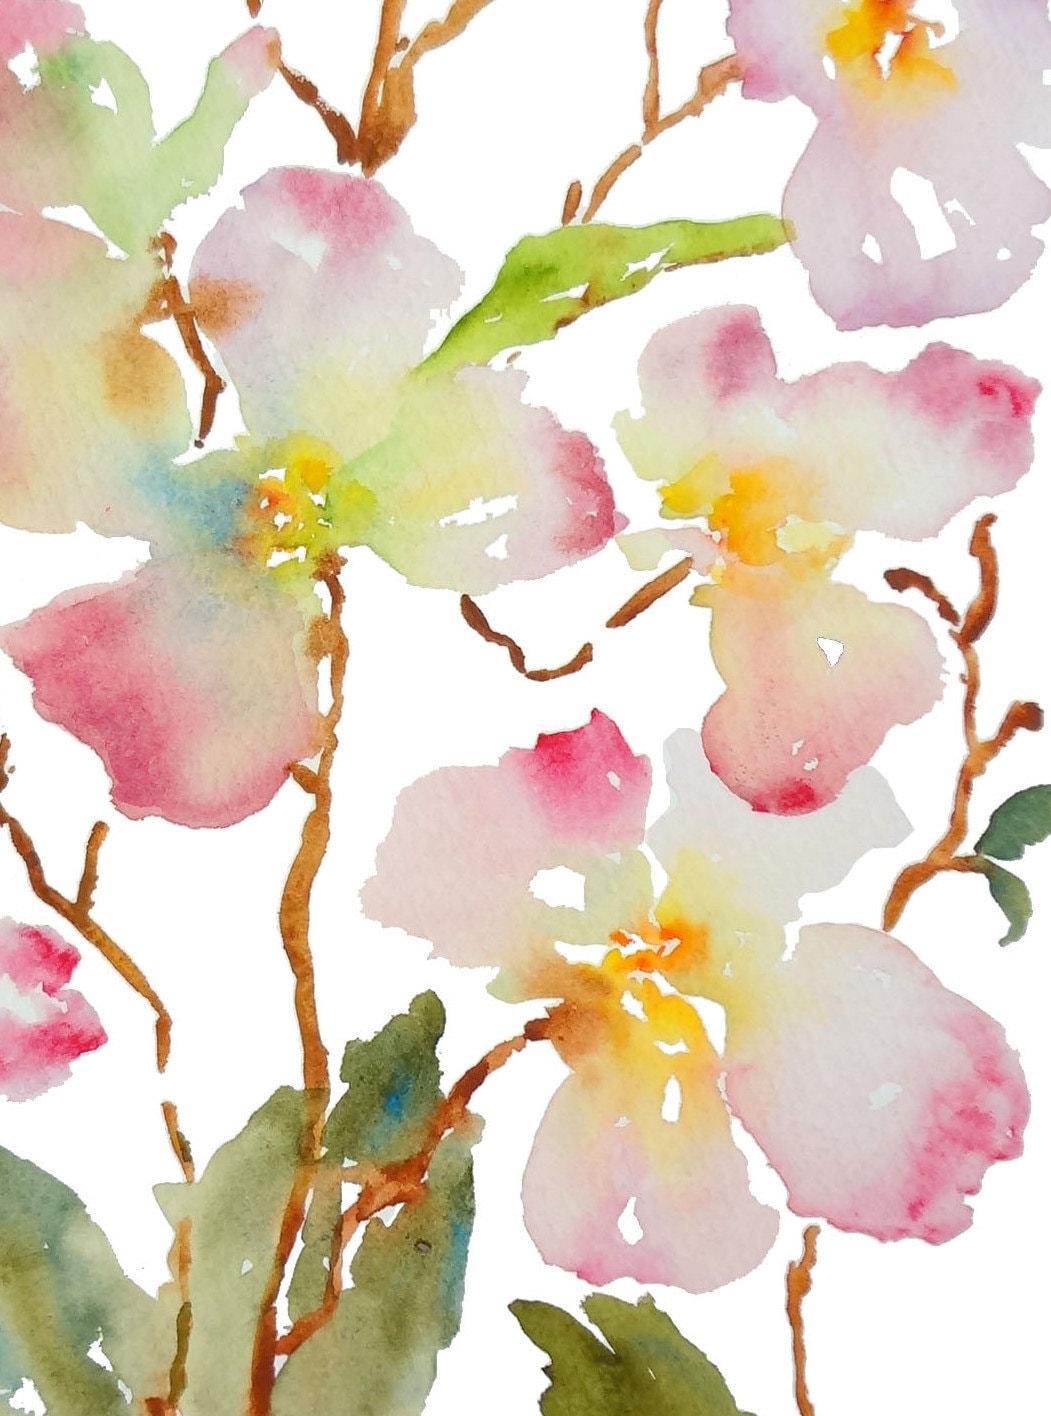 Dogwood Inspiration Watercolor Flowers Fine Art Print 8x10